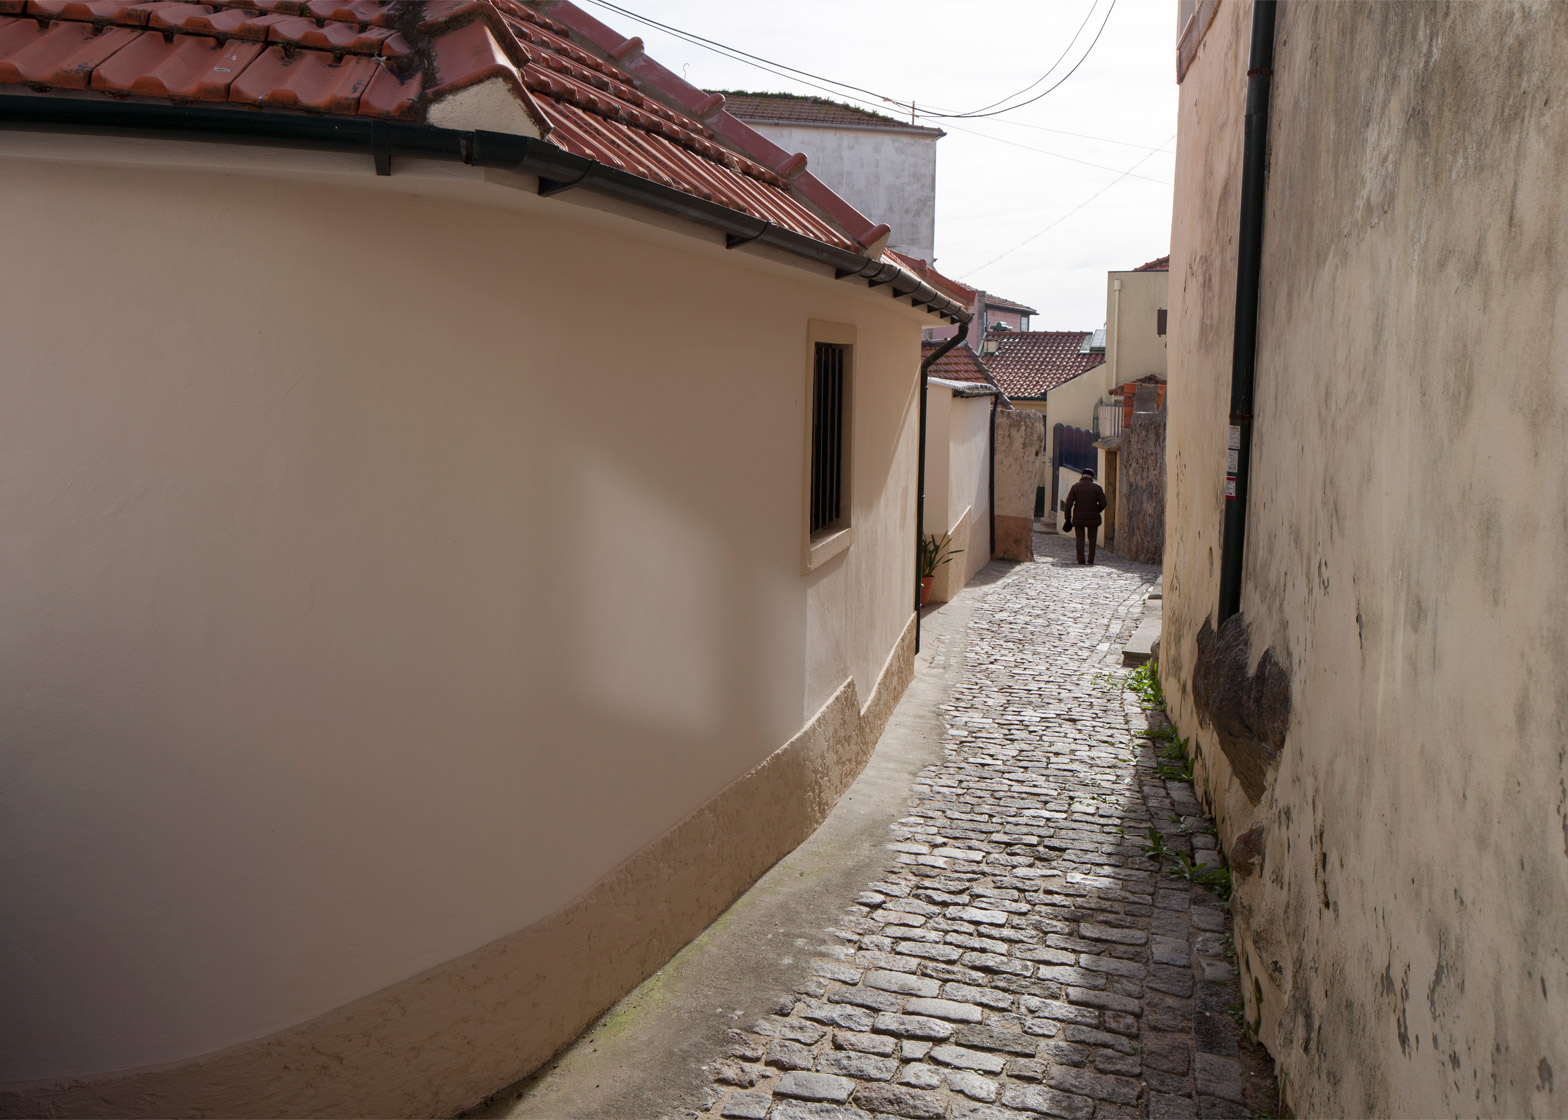 Architecture-courtyard-design-studia-interiors-osnovadesign-osnova-poltava-18